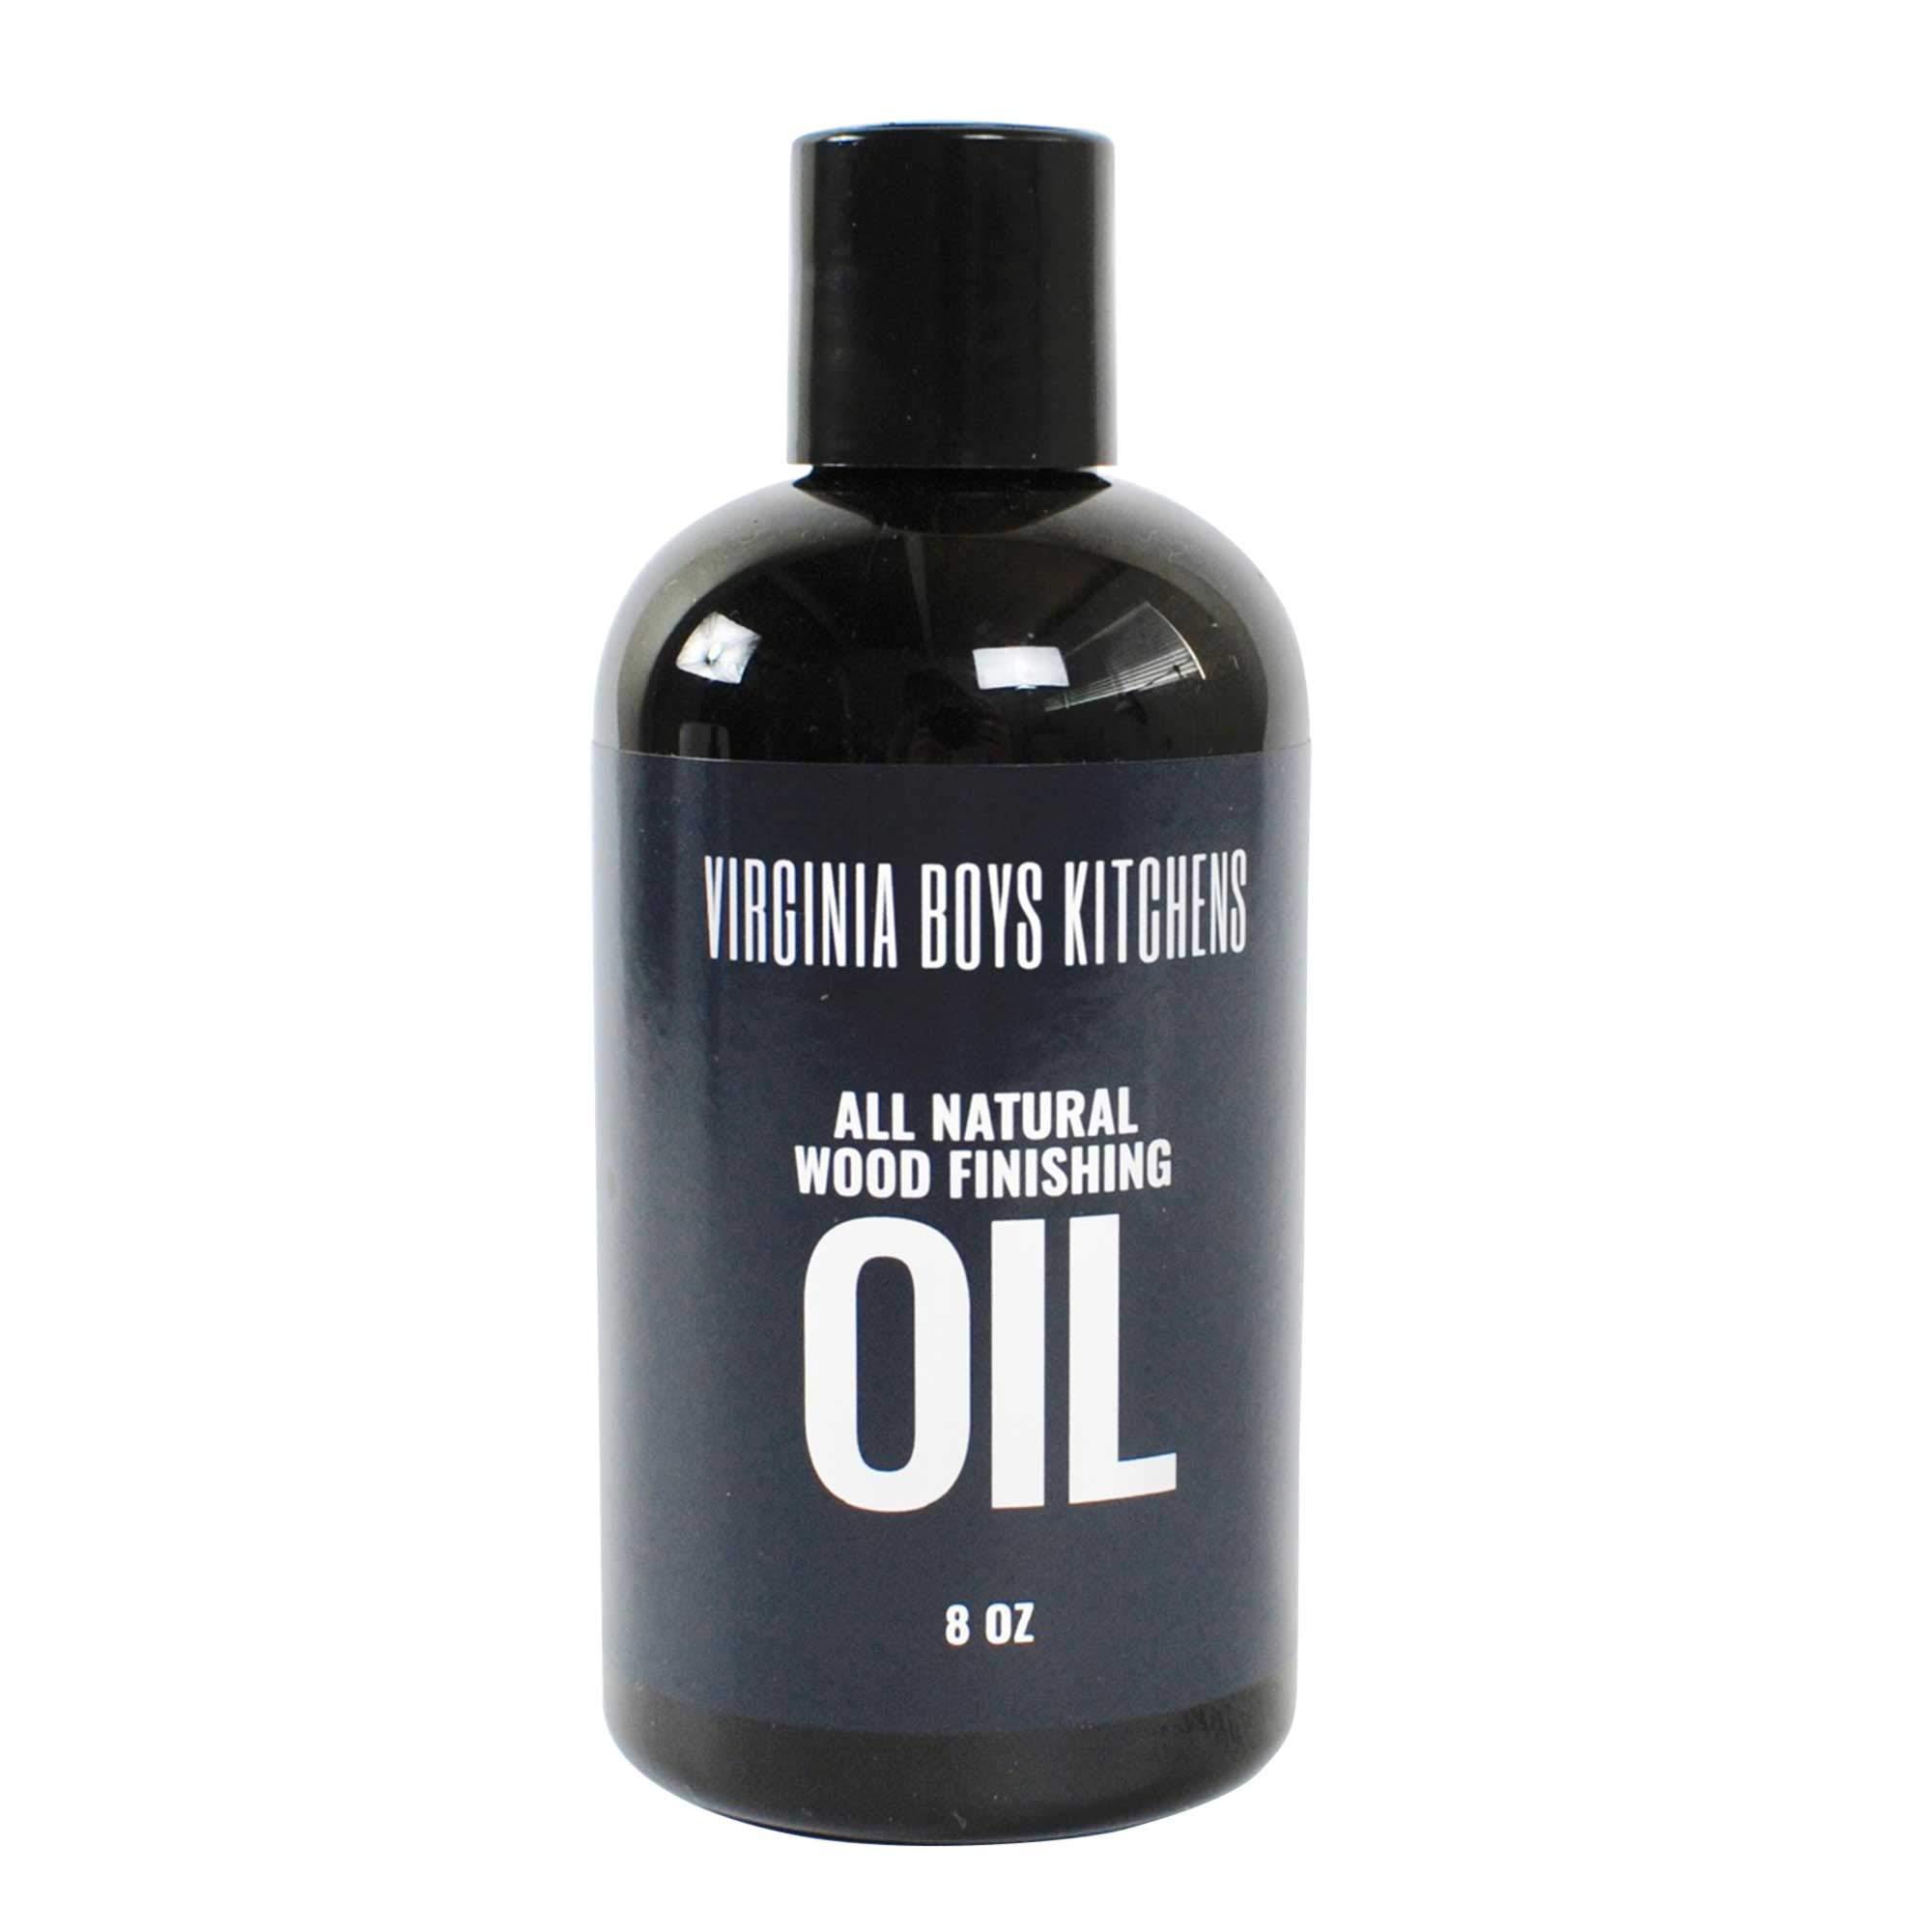 Virginia Boys Kitchens All Natural Wood Seasoning Oil (8 oz Bottle) by Virginia Boys Kitchens (Image #1)